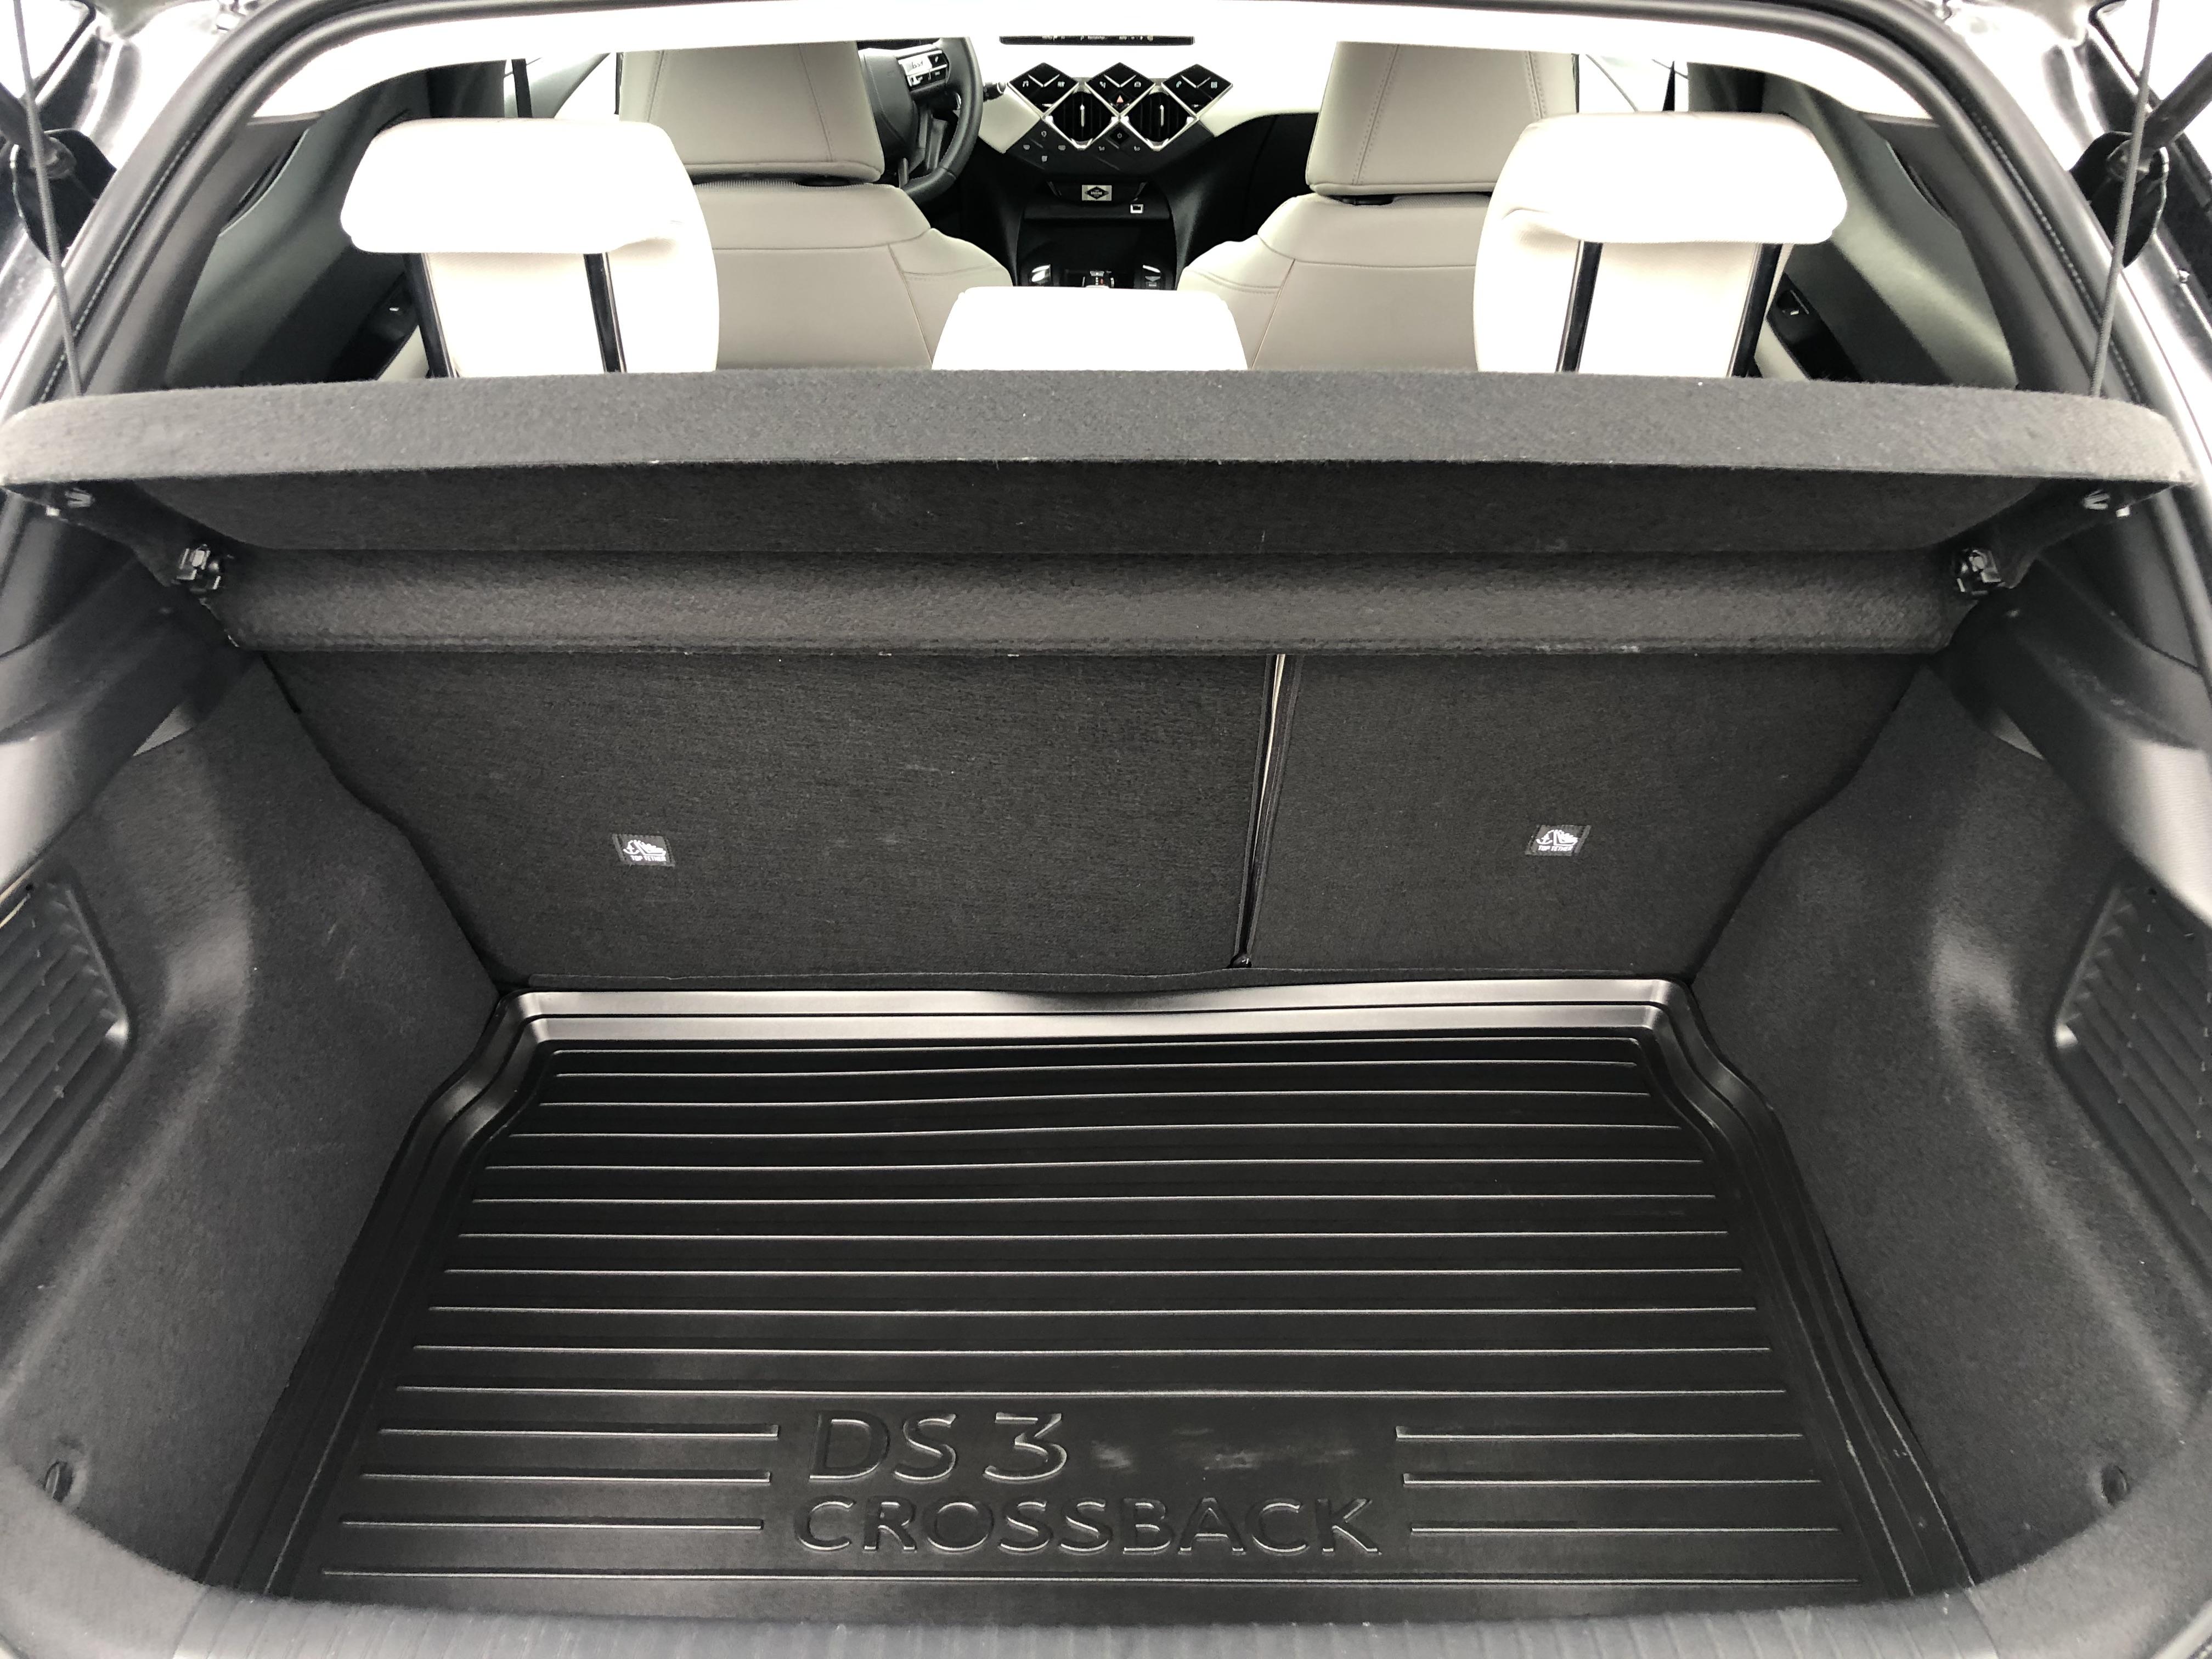 DS3 Crossback 1,2 Puretech 130cv Grand Chic EAT8